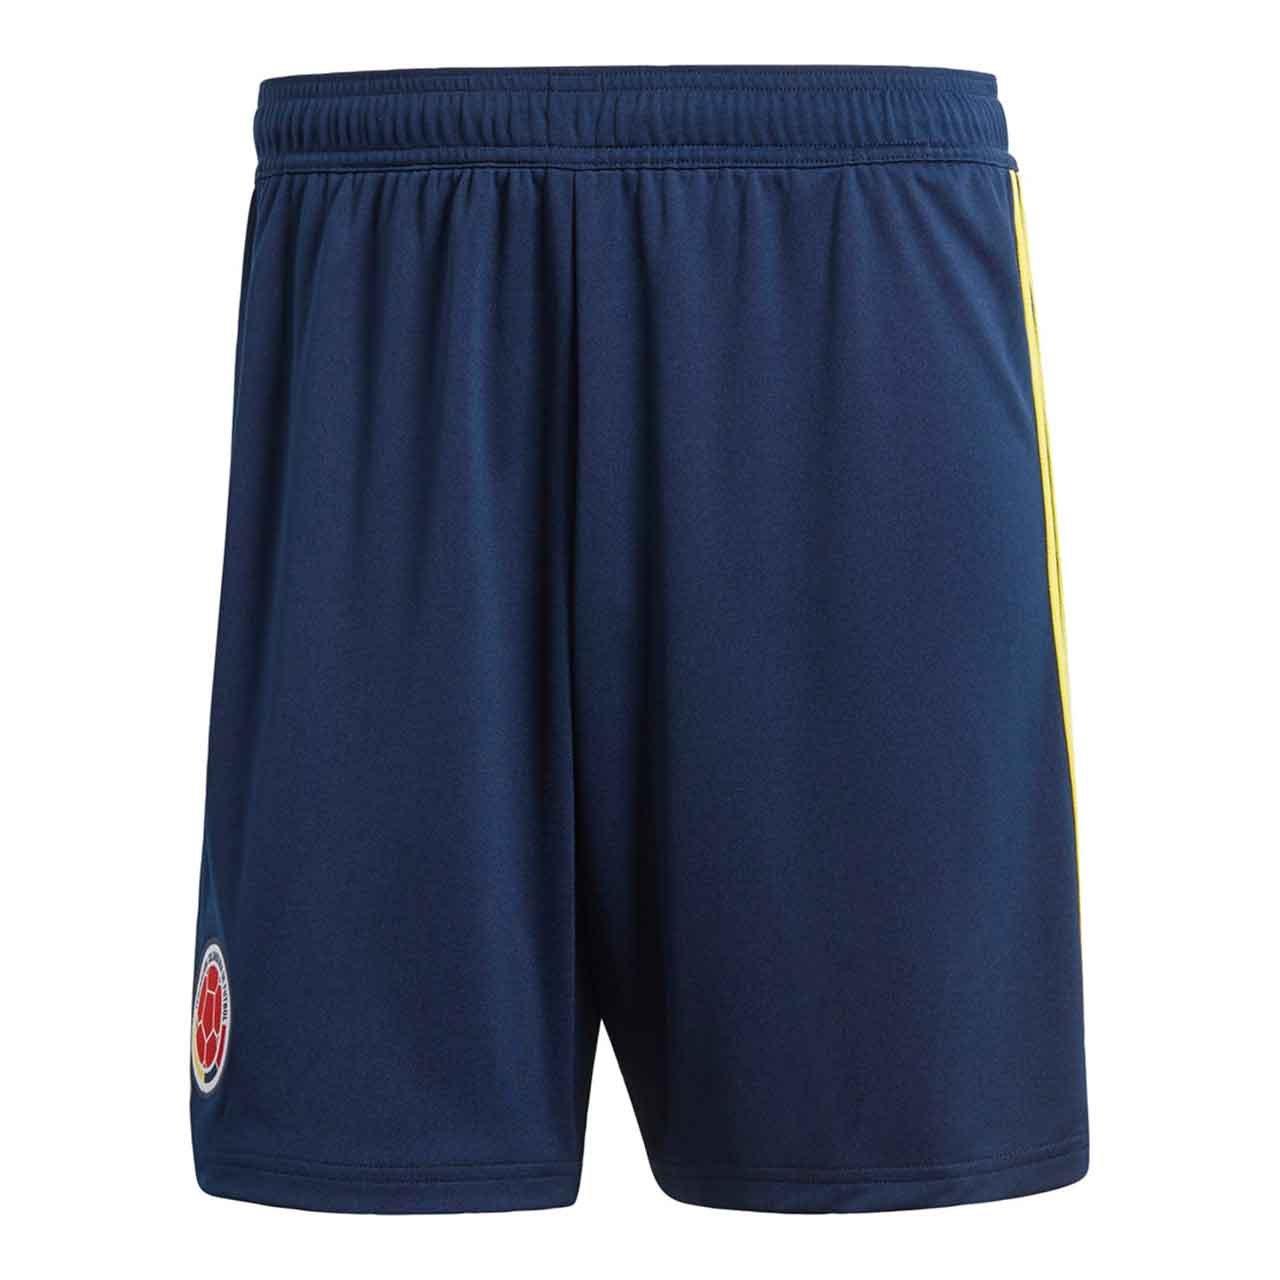 2018-2019 Colombia Home Adidas Football Shorts (Navy) B077JLQHHZカレッジネイビー/ブライトイエロー 日本 J8XO-(日本サイズ9XL相当)